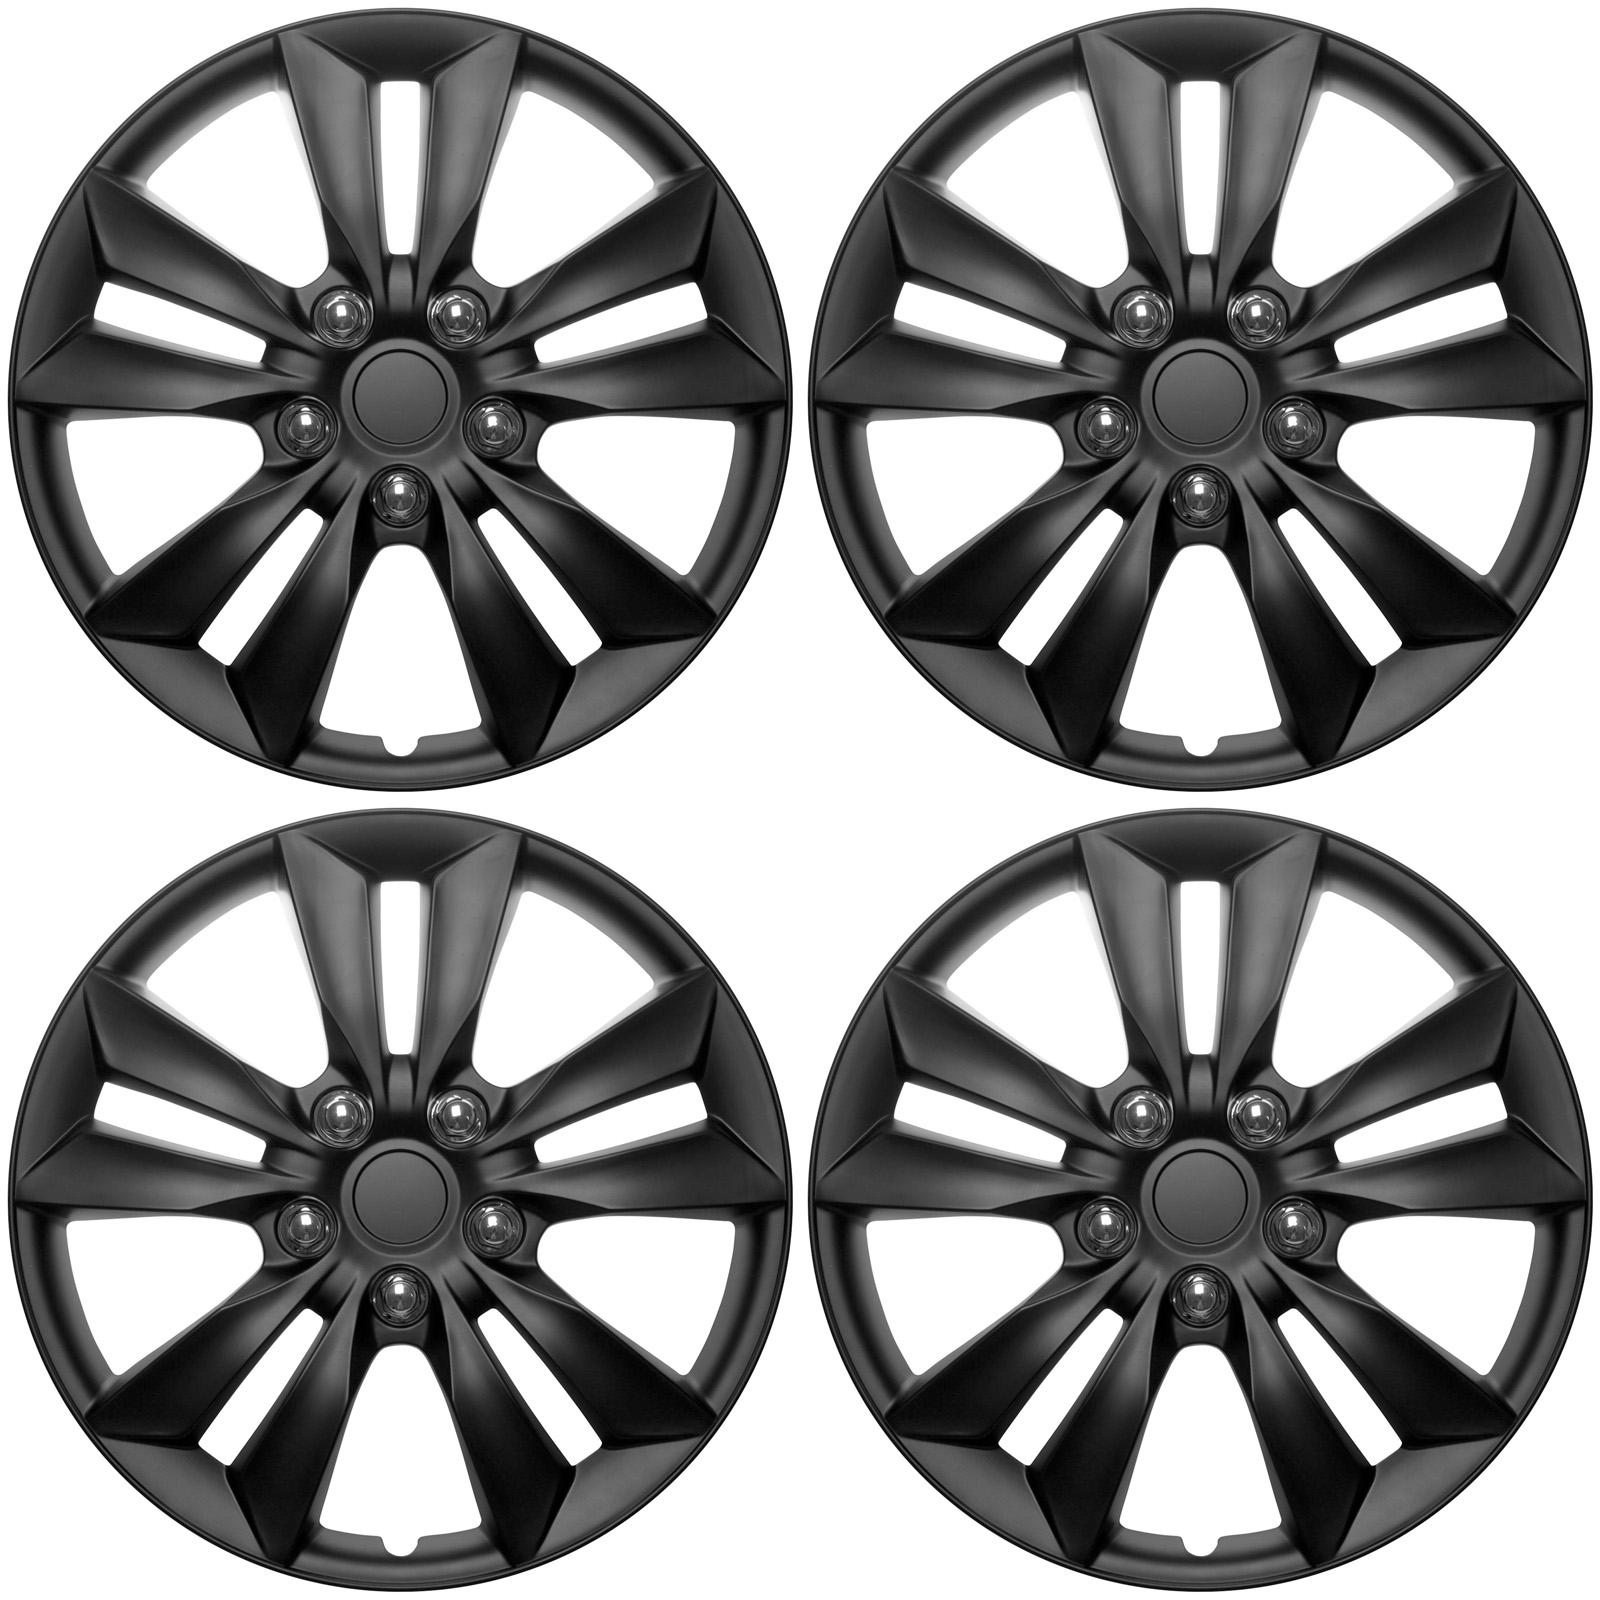 4 Pc Set Of 16 Quot Matte Black Hub Caps For Oem Steel Wheel